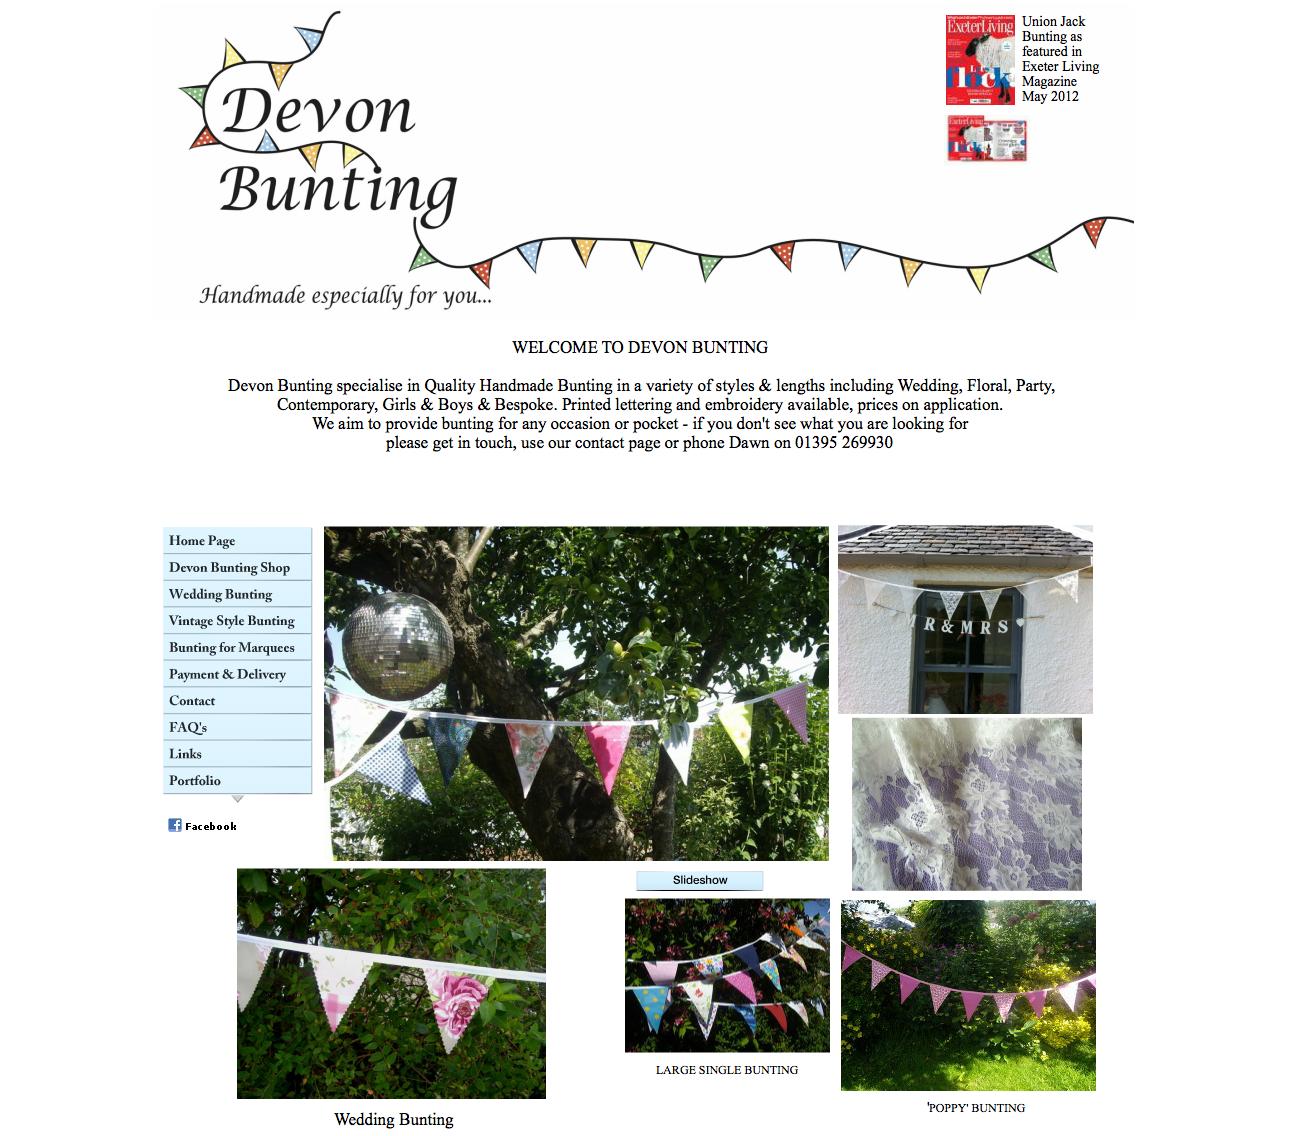 Devon Bunting